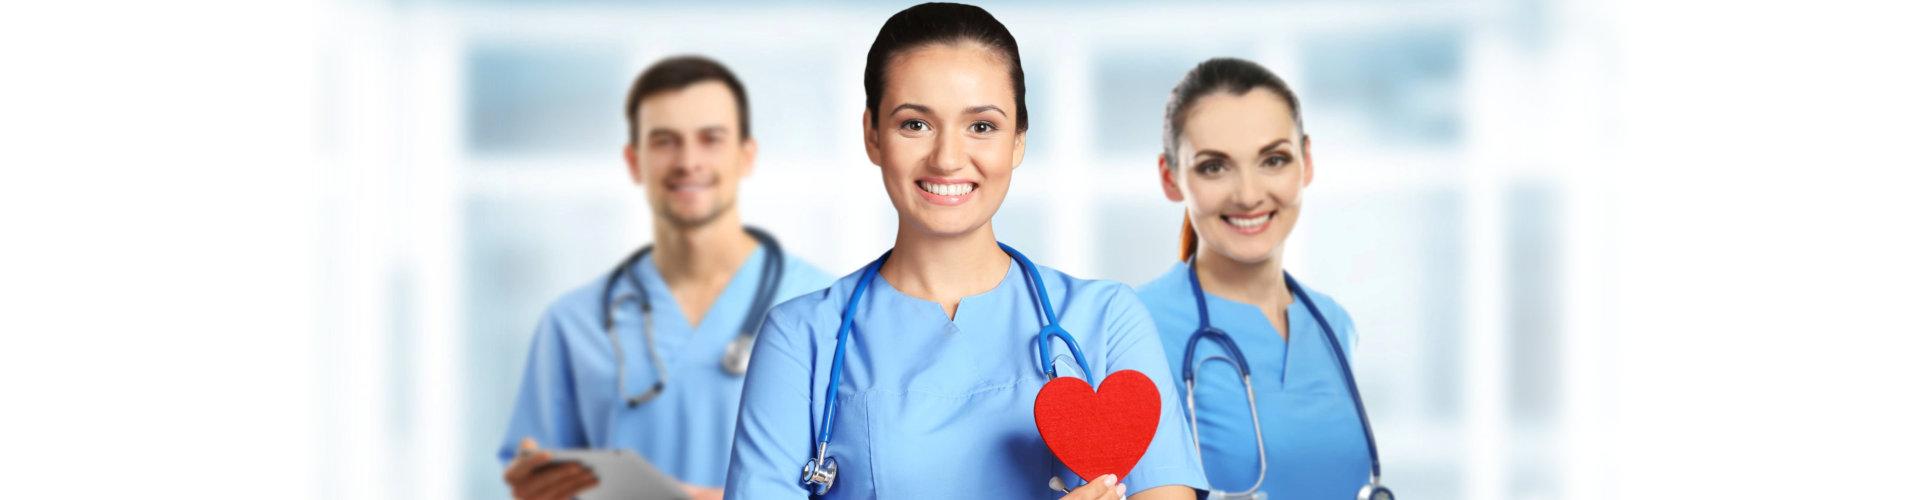 three medical professionals in uniform